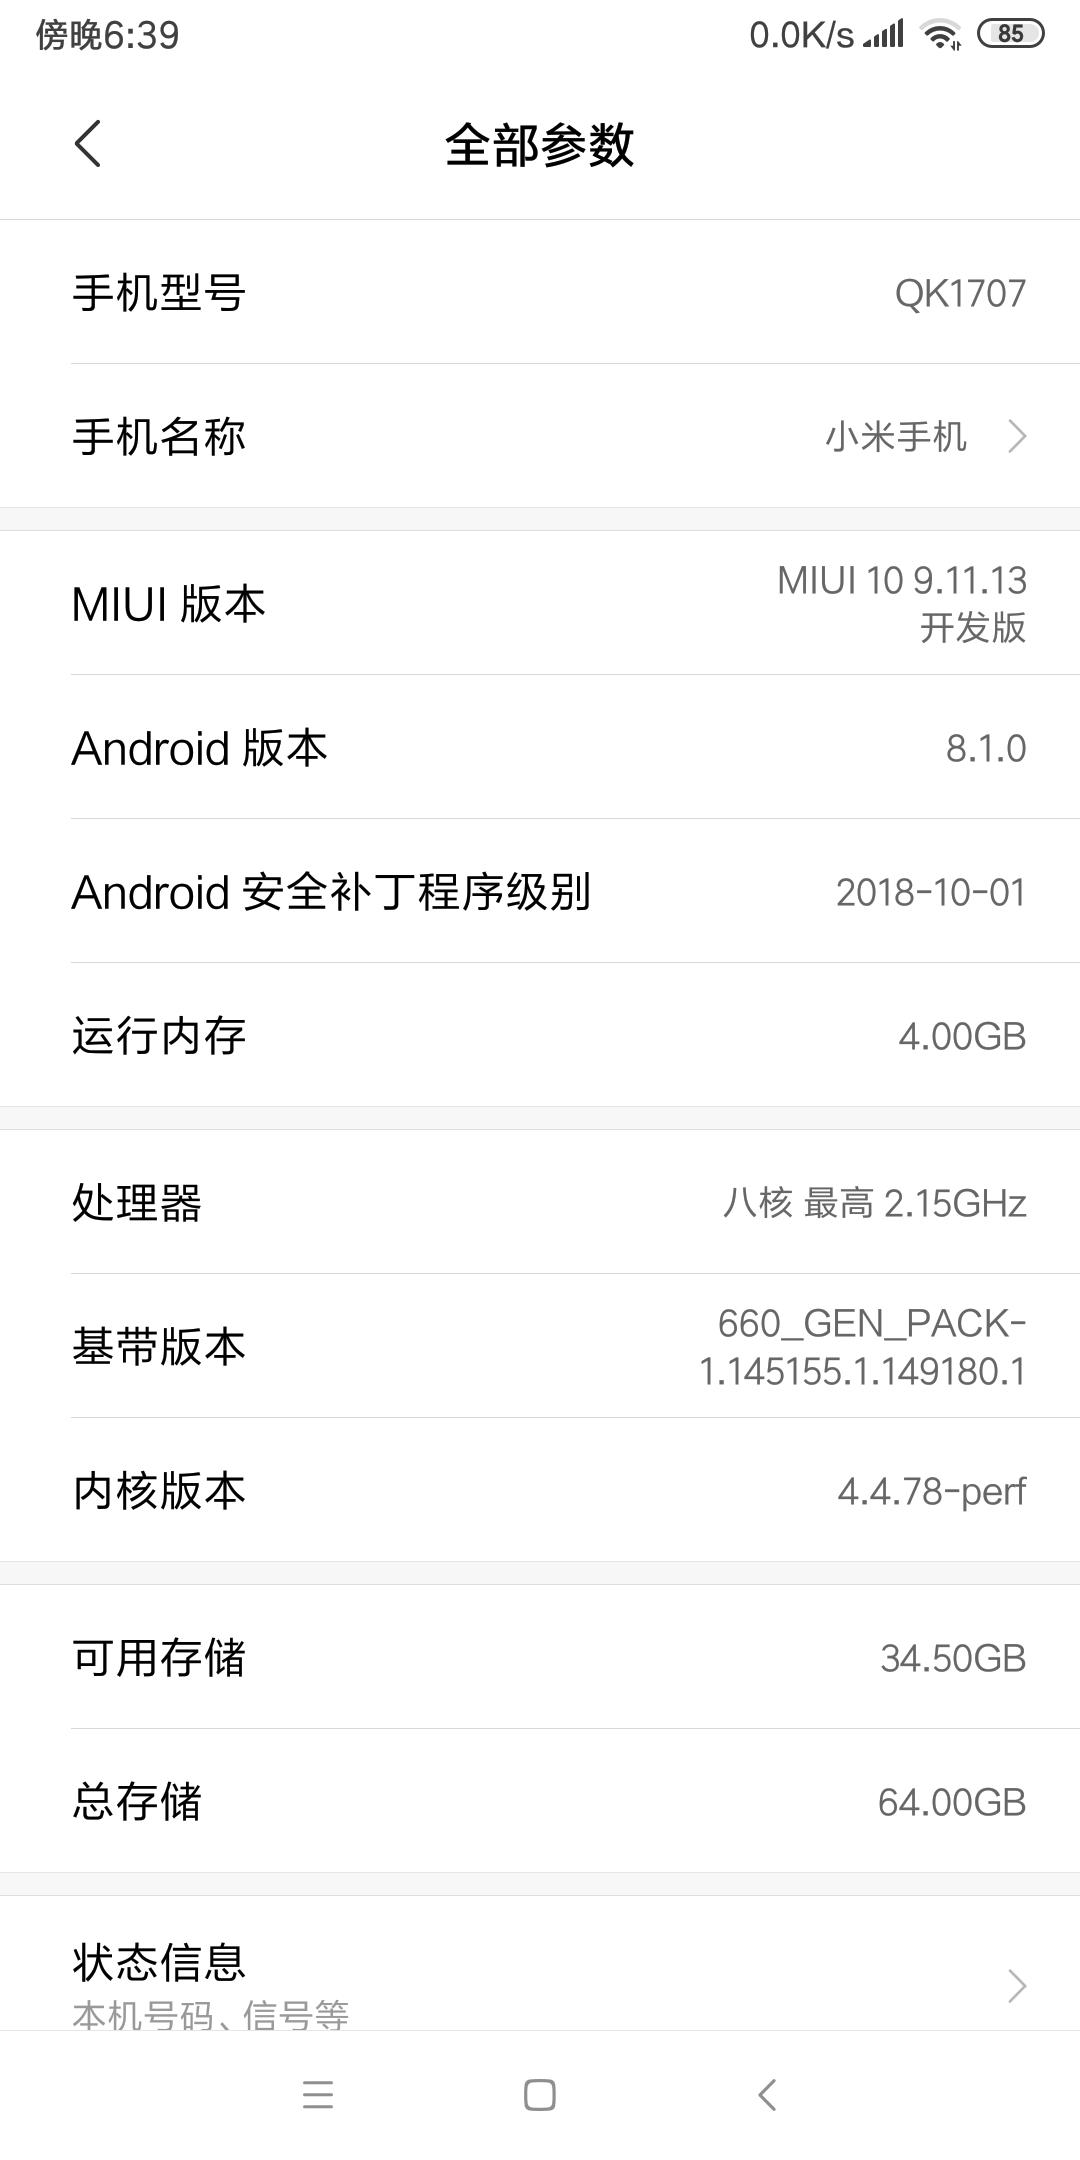 Screenshot_2020-01-27-18-39-23-749_com.android.settings.png